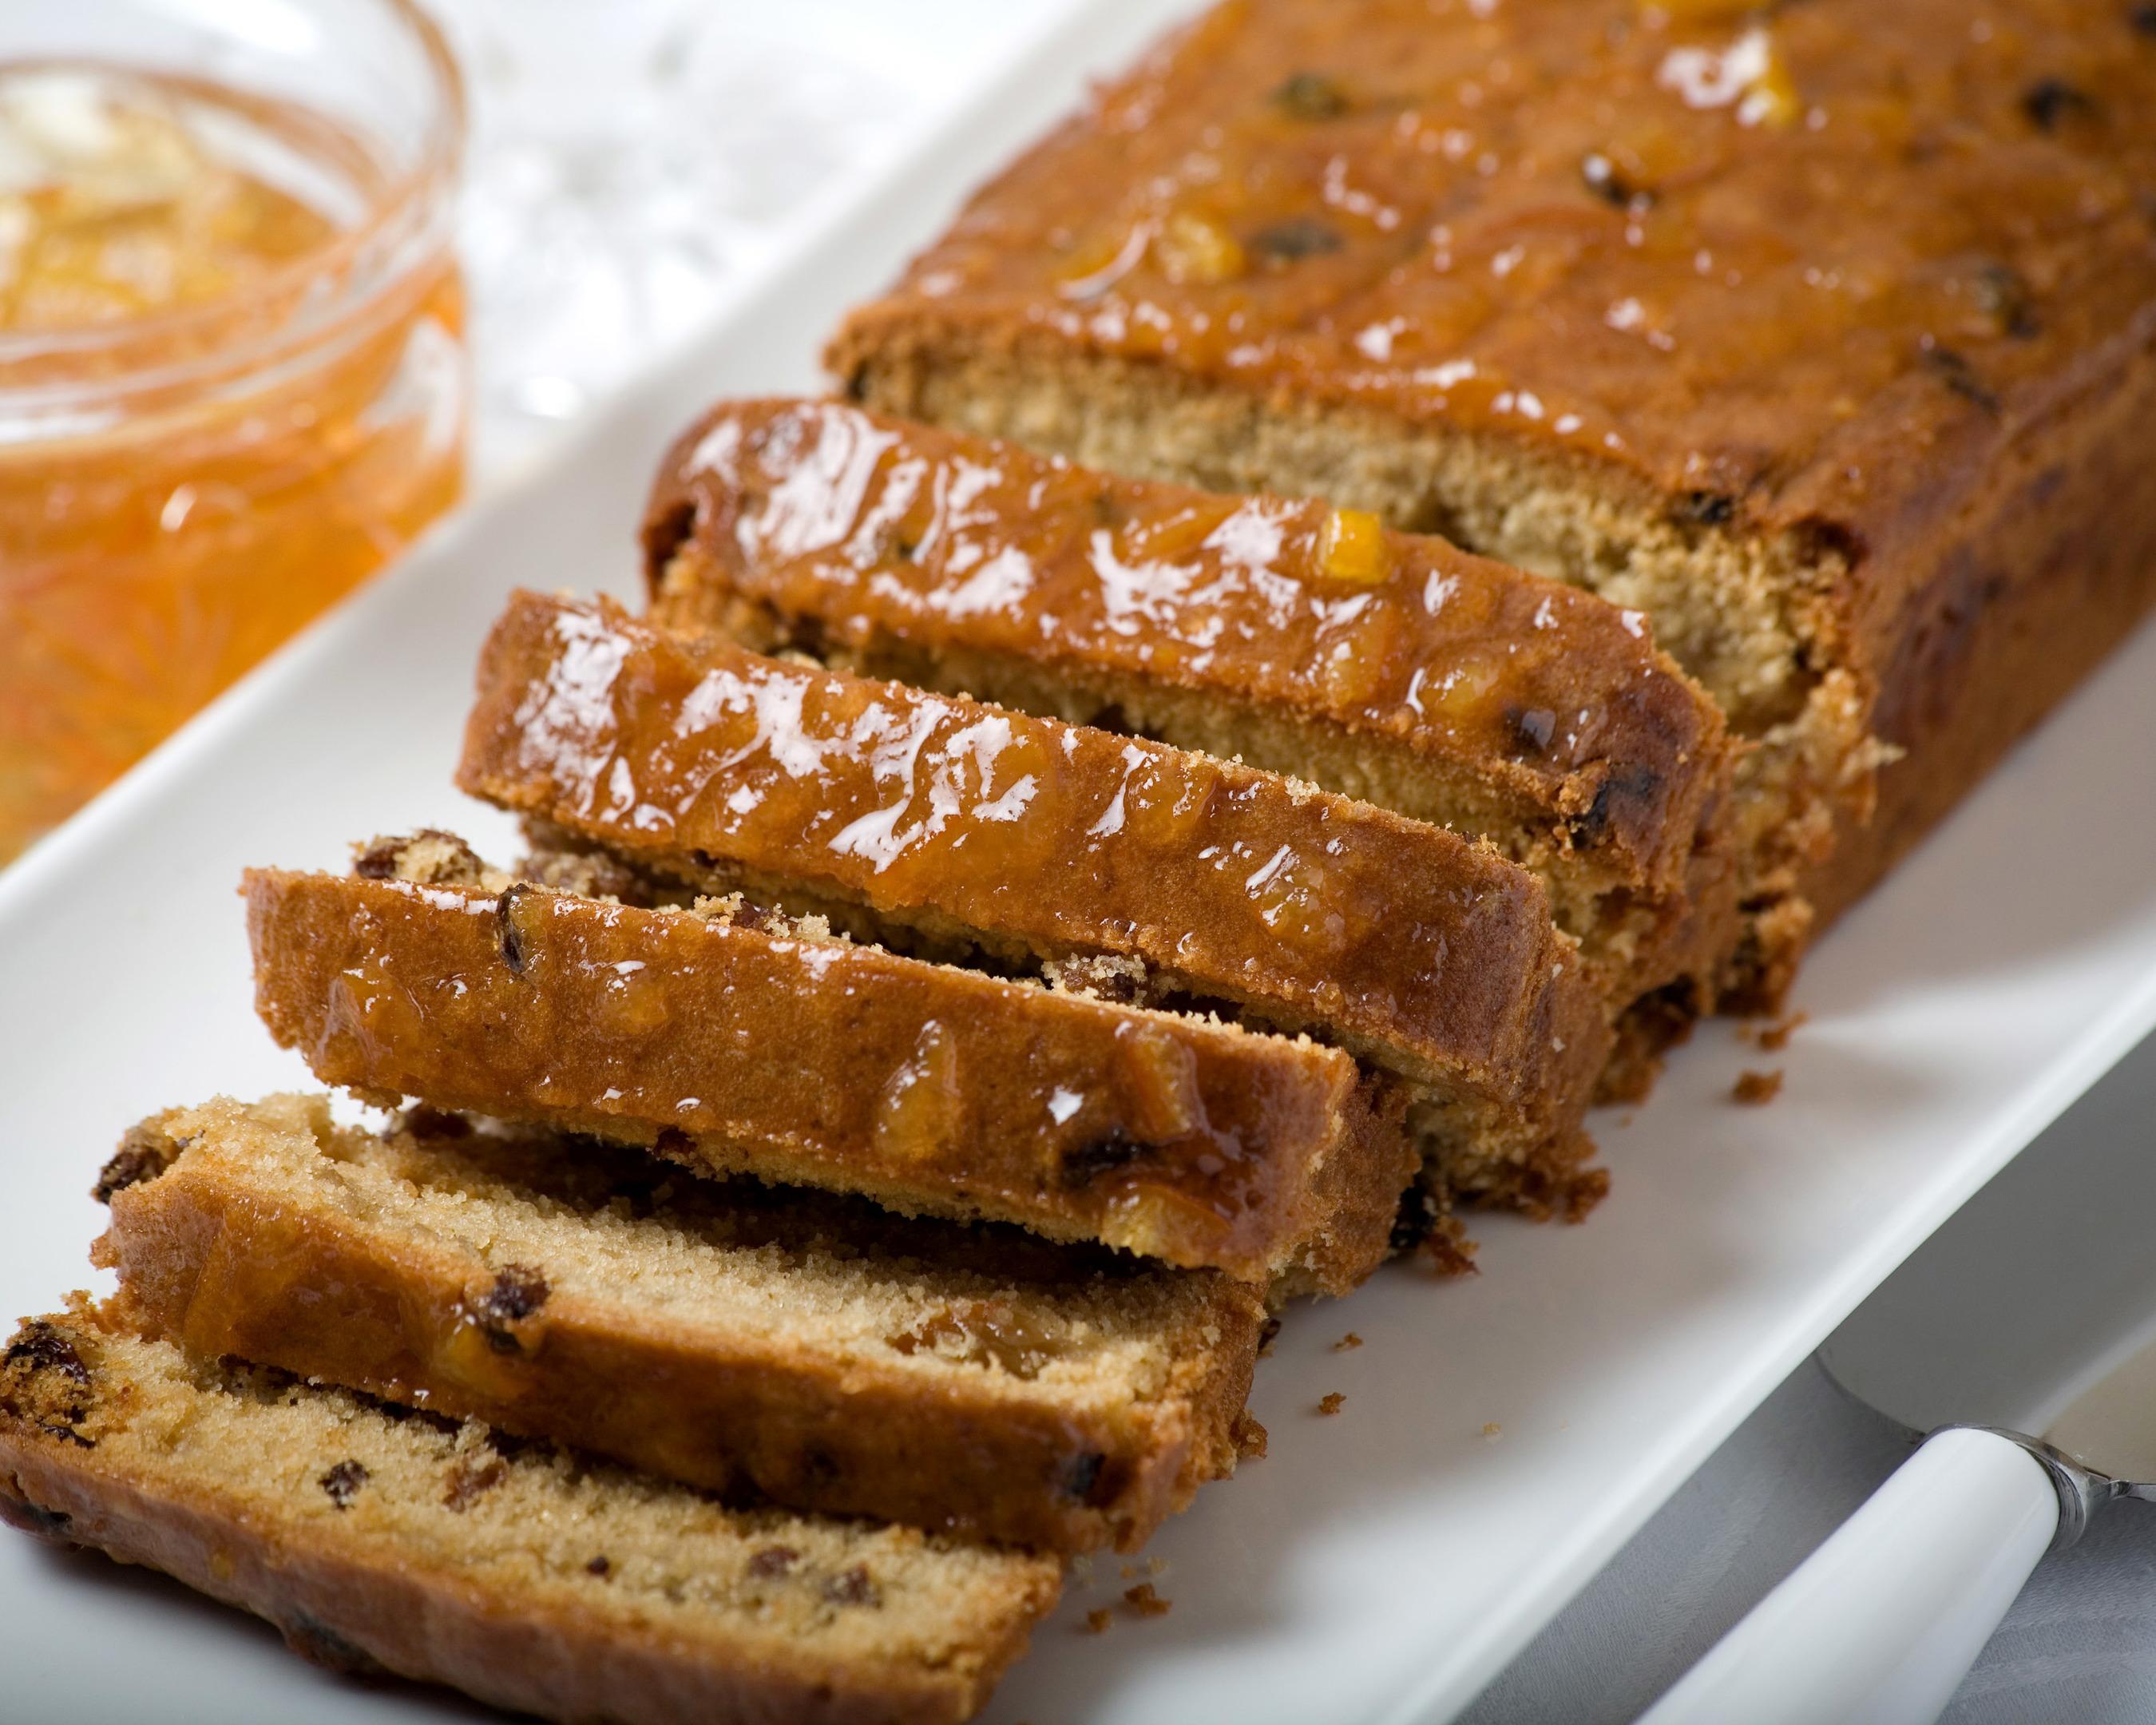 Orange Marmalade Loaf by Deans of Huntly Ltd